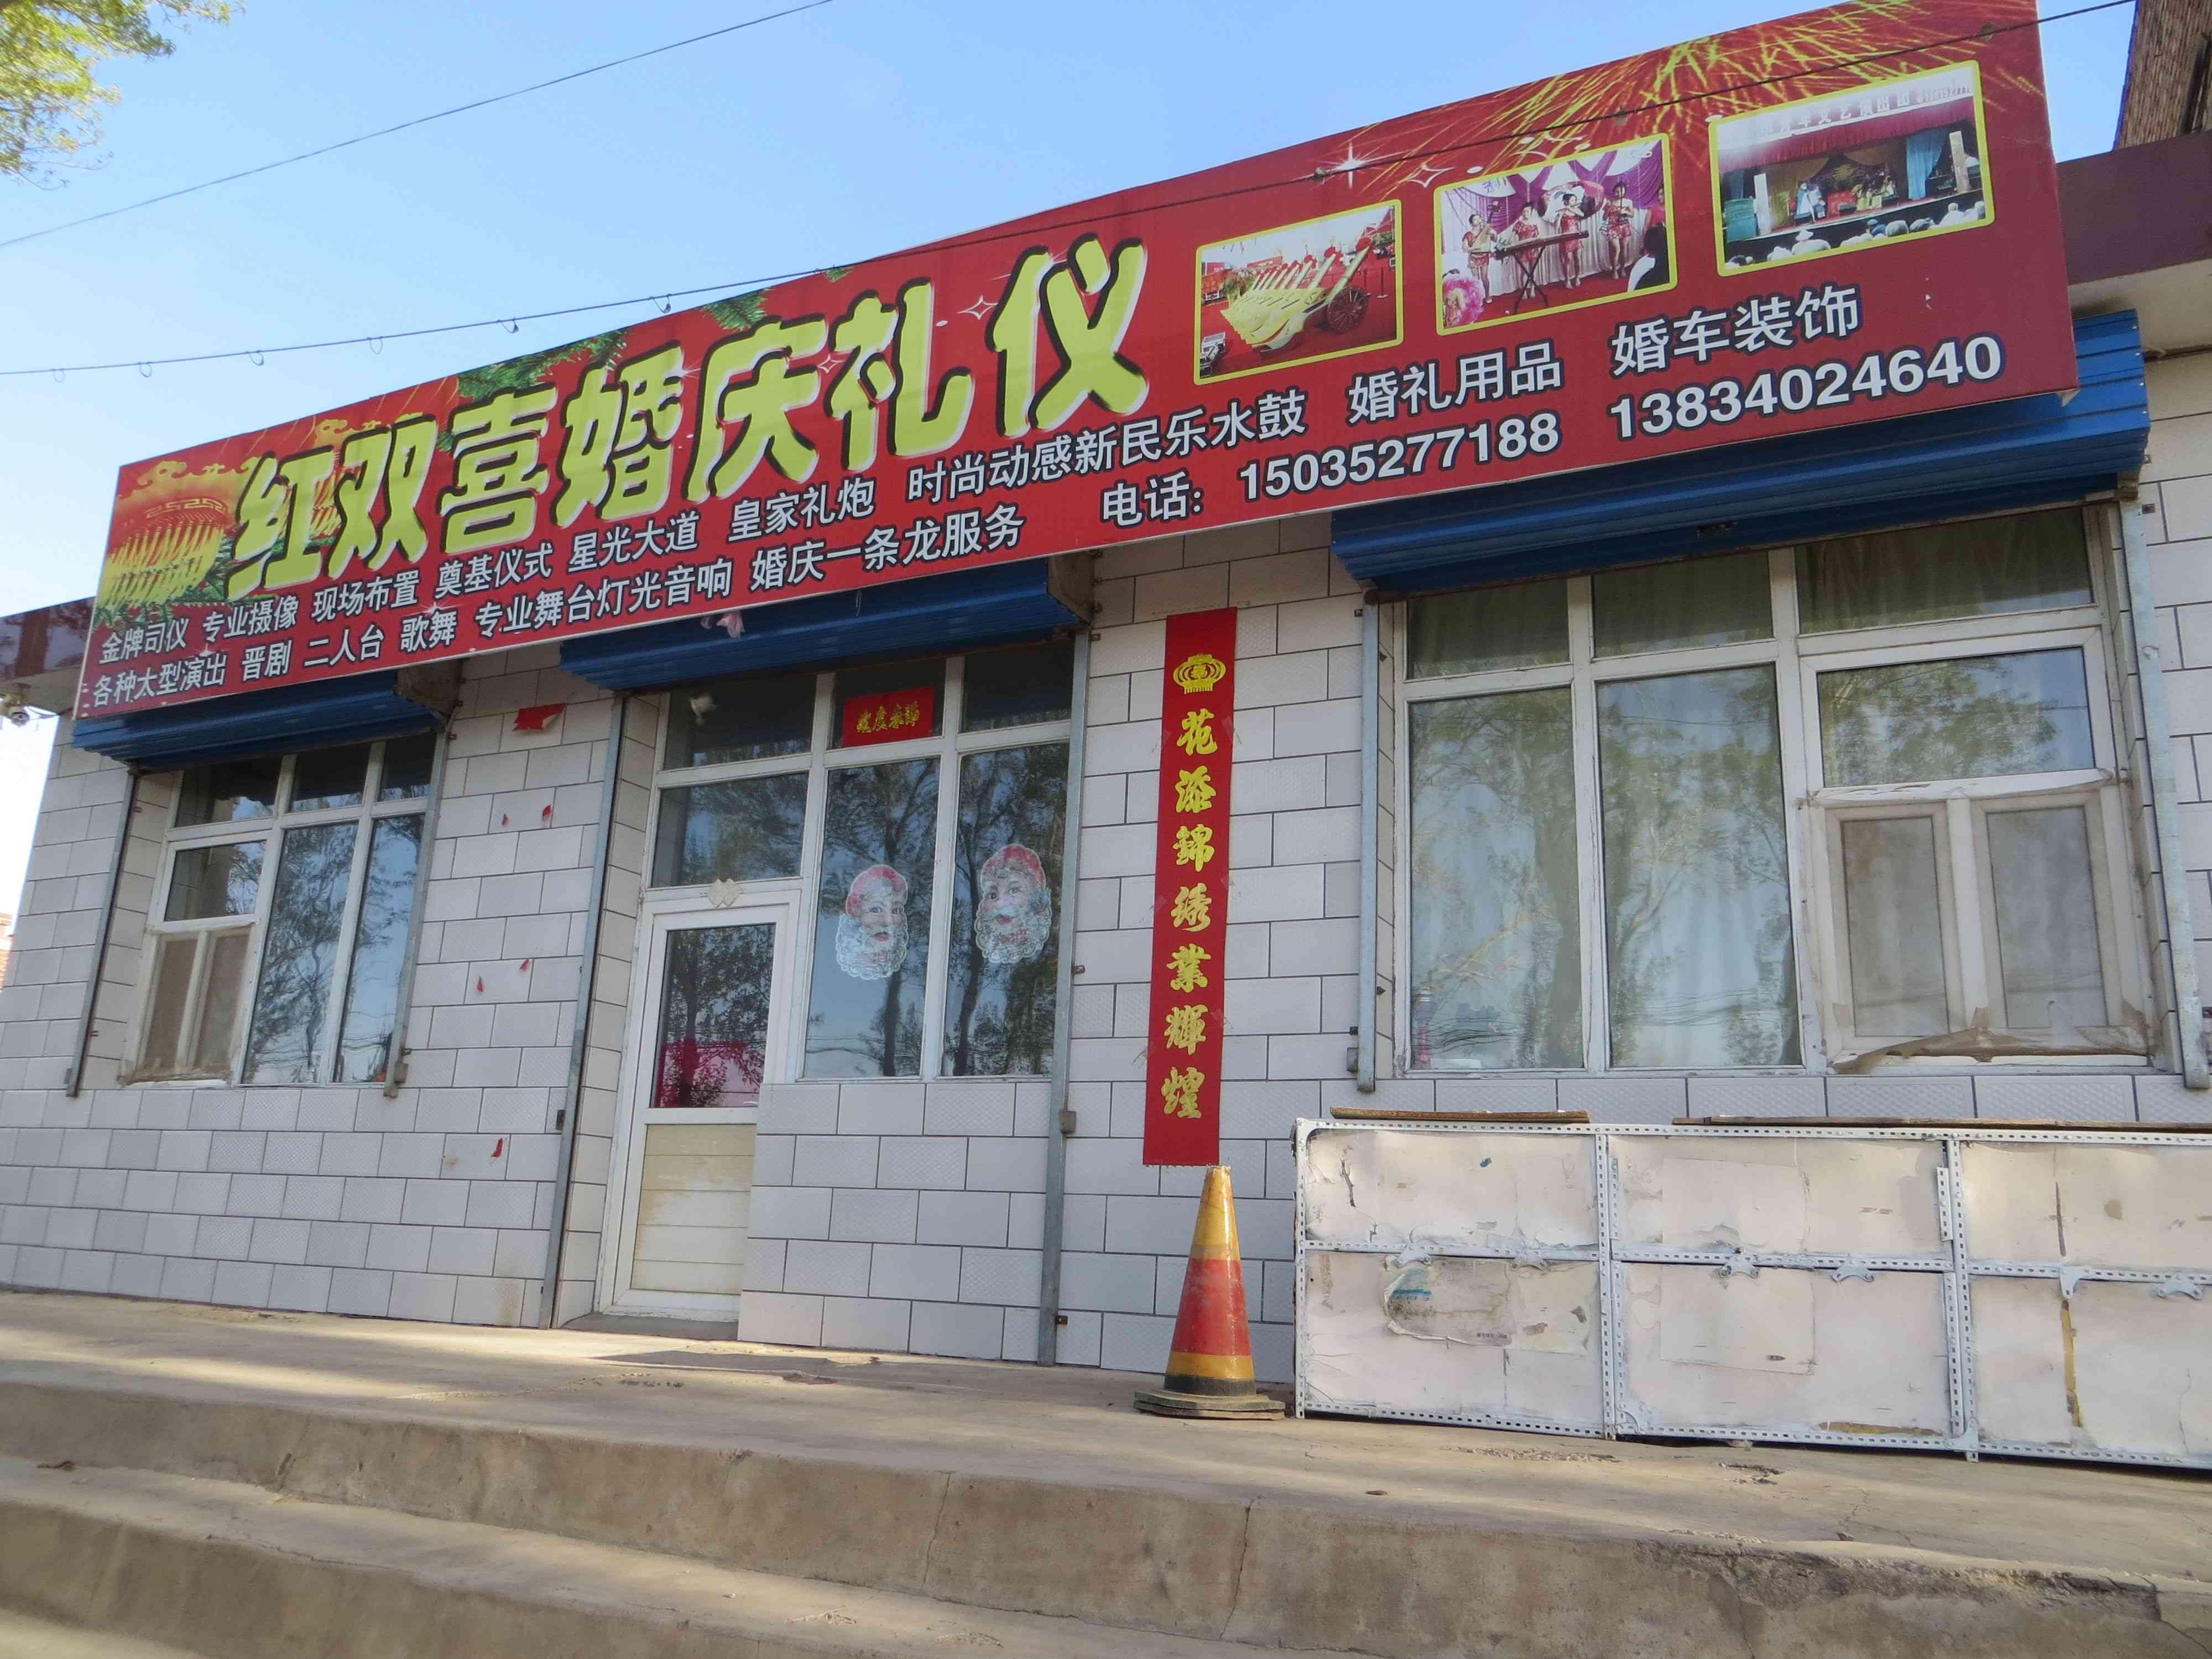 Yang Ying shopfront